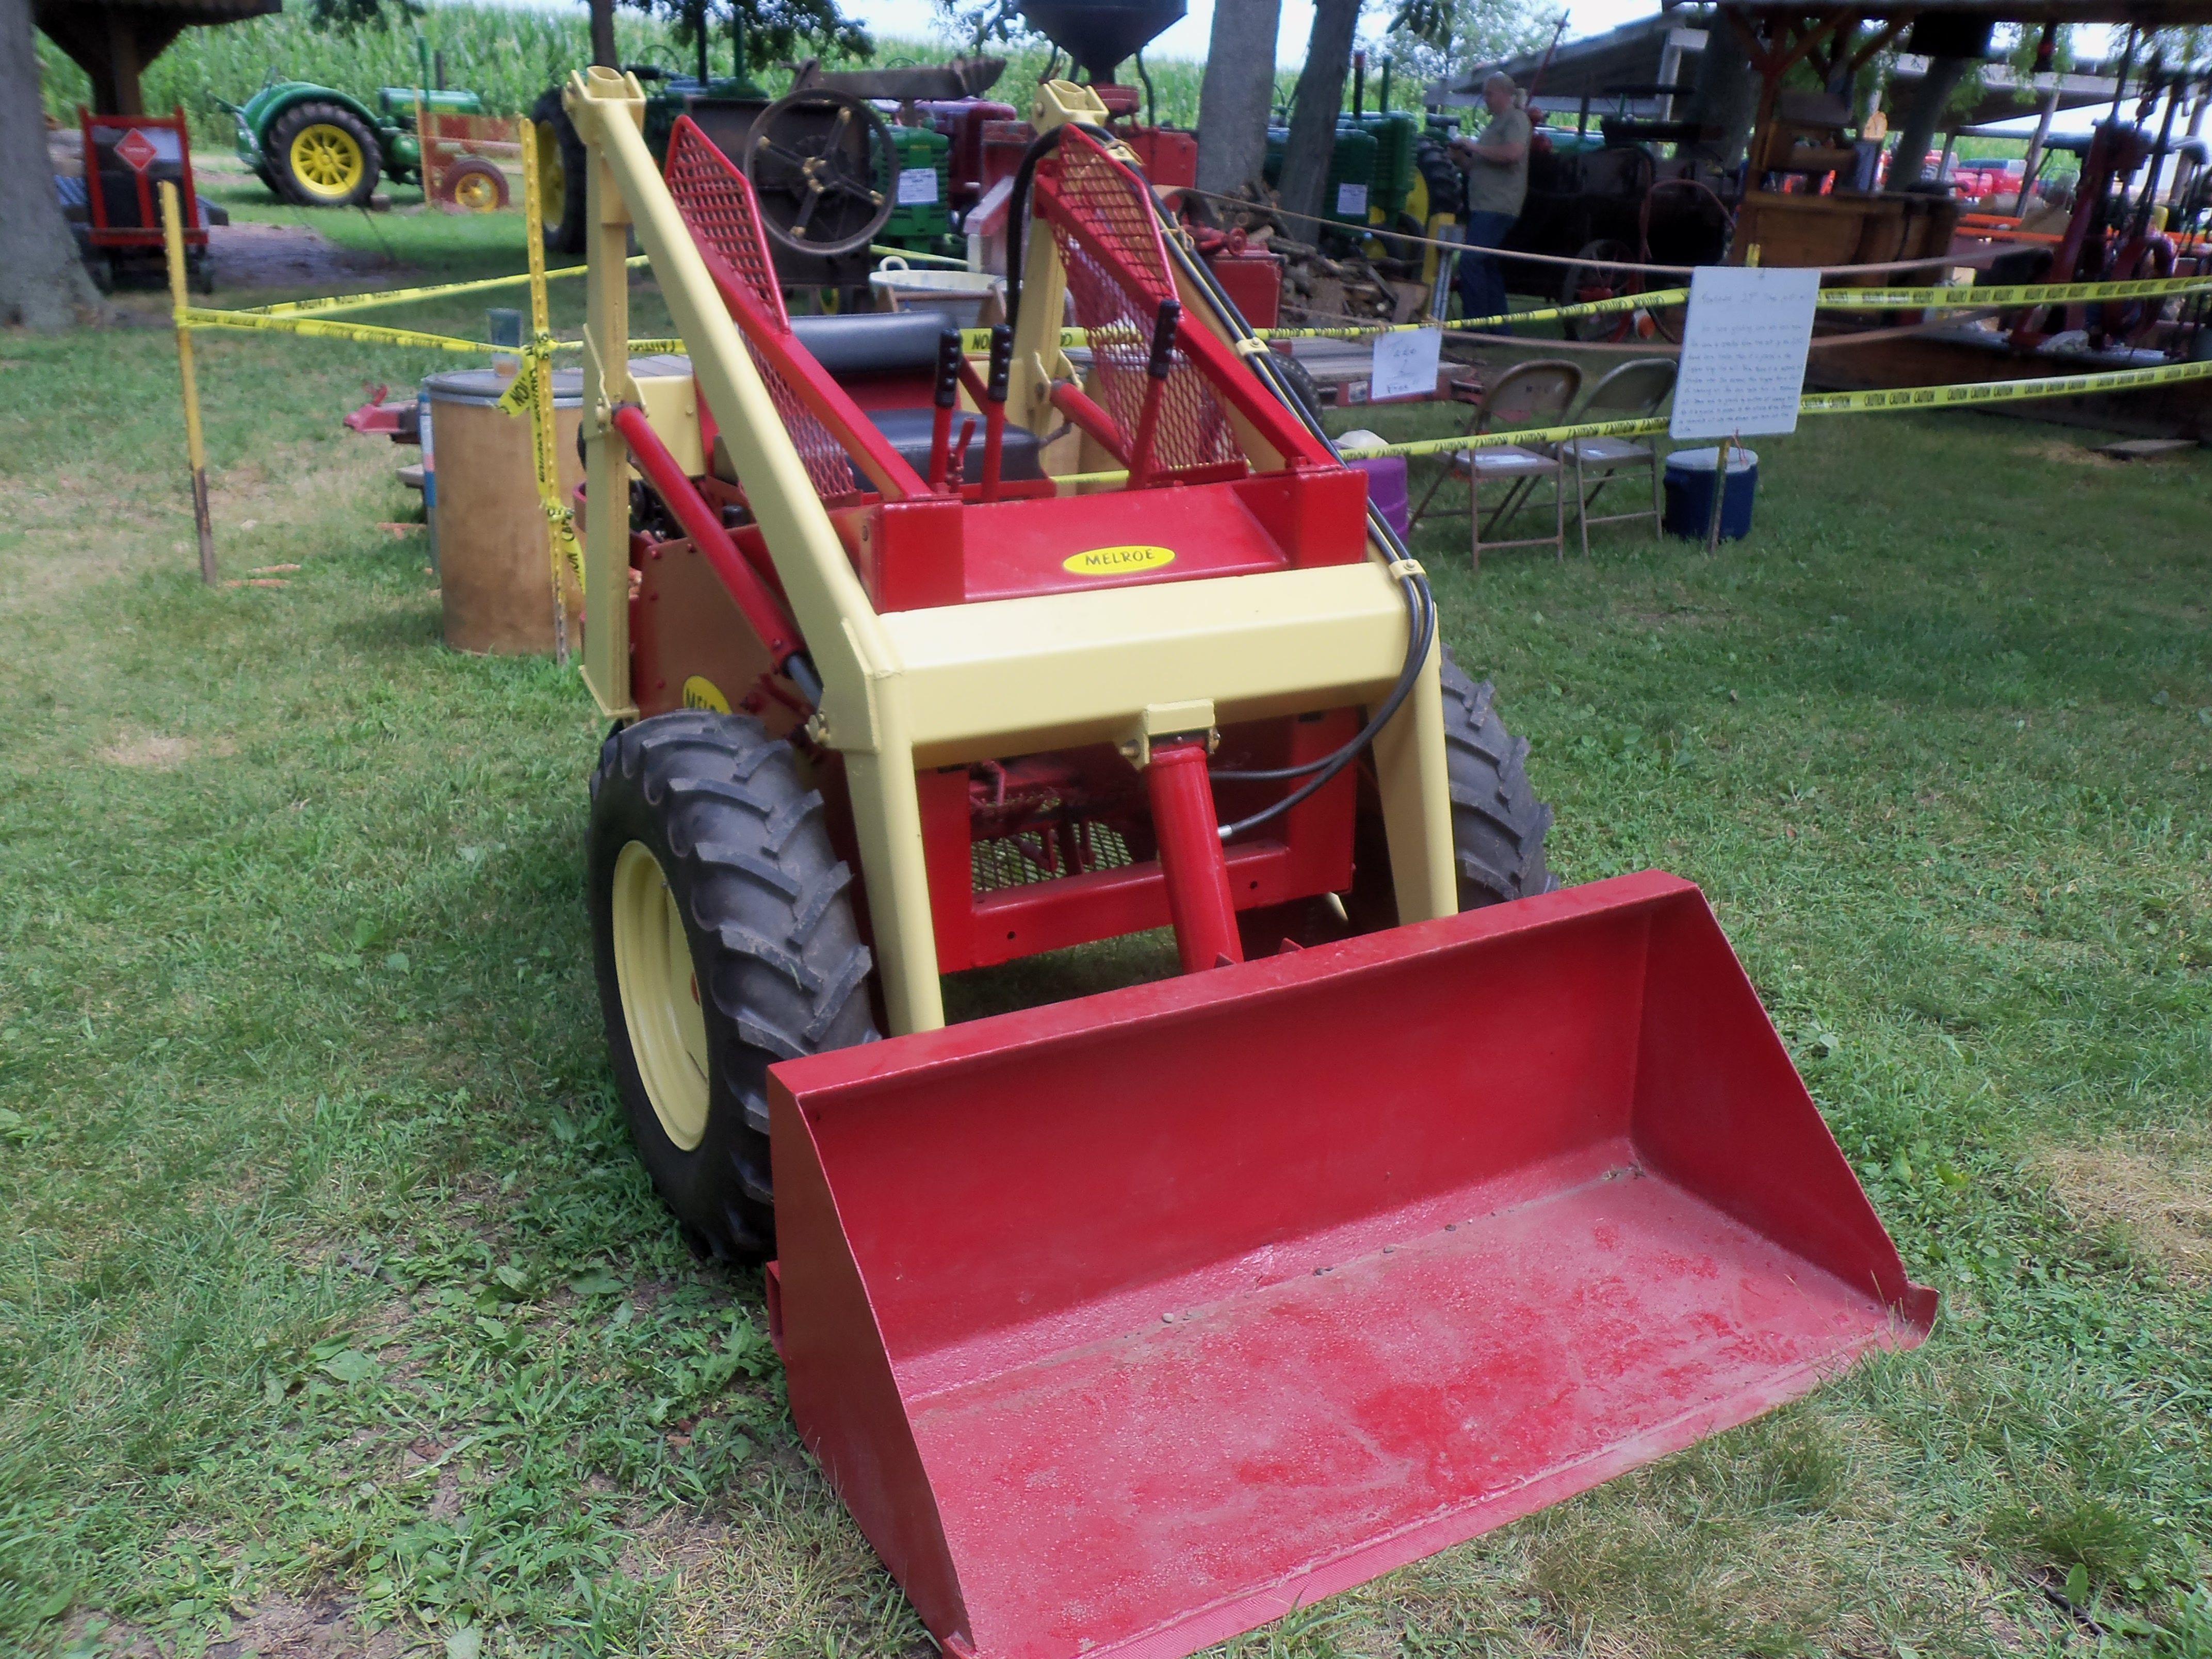 1961 Melroe Bobcat 3 wheel skid steer loader   Construction